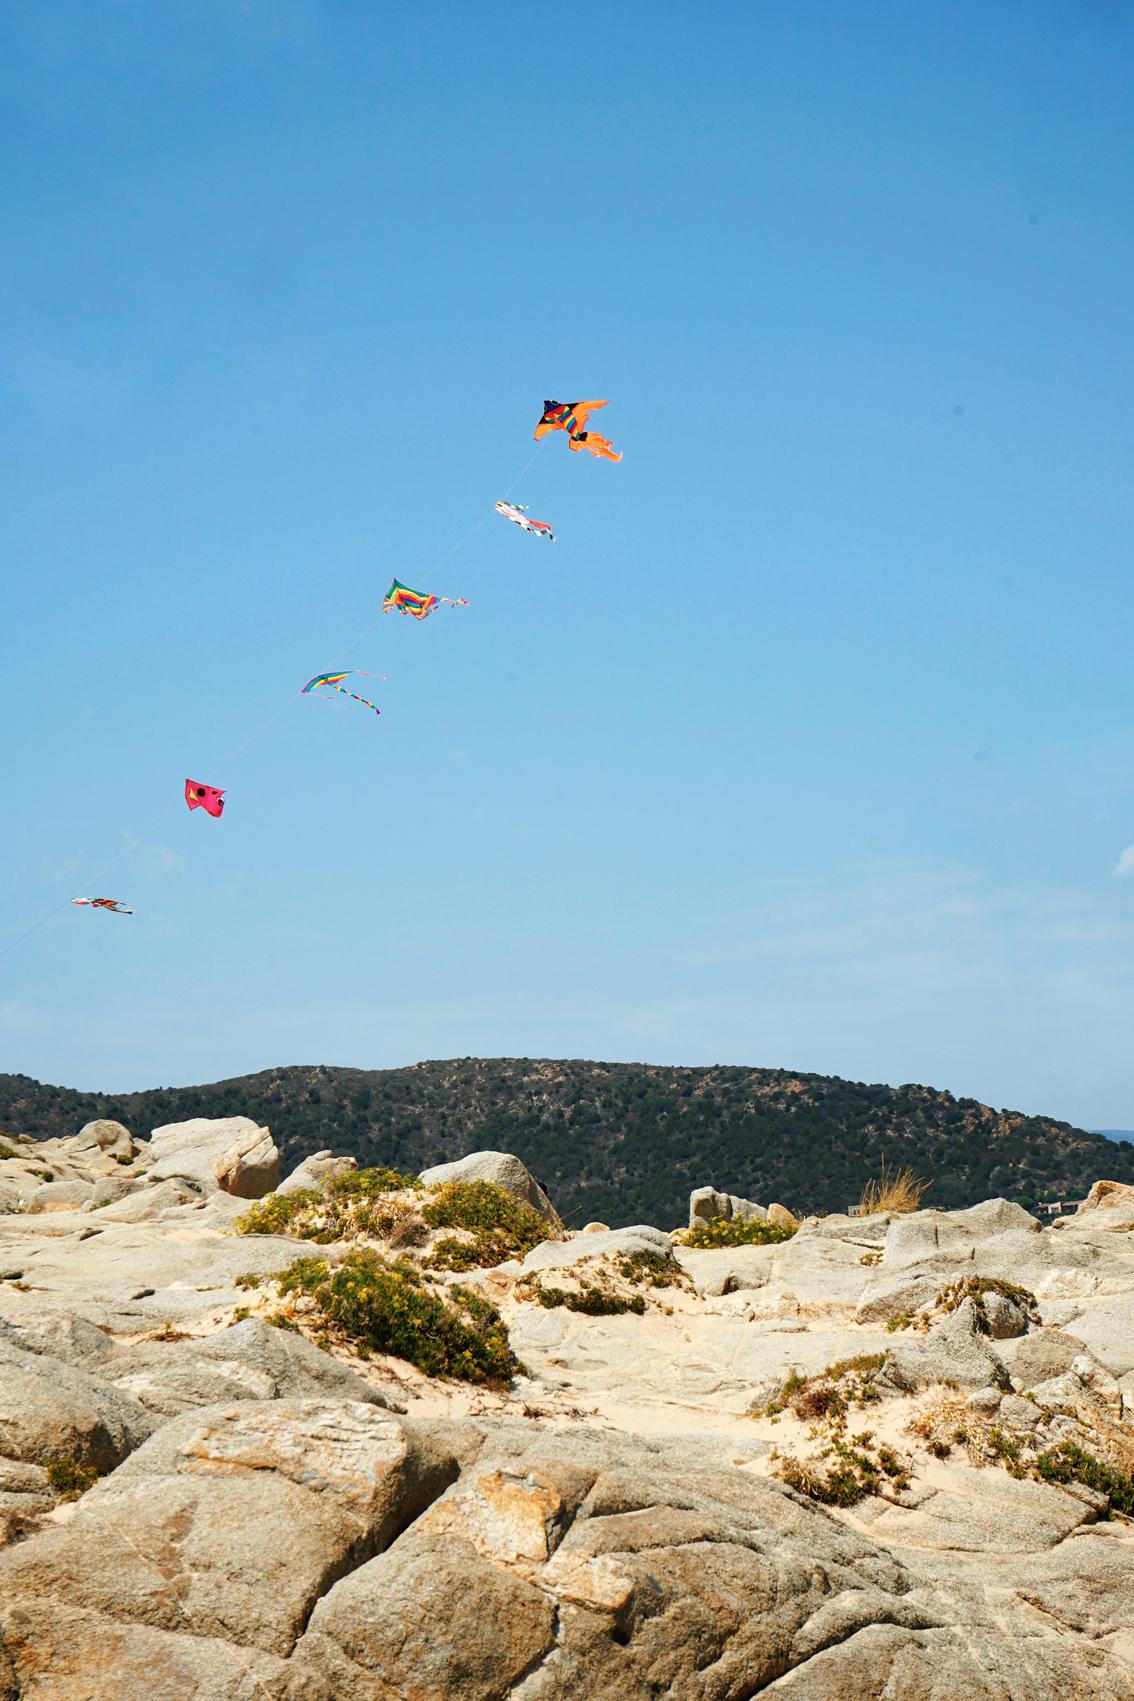 15 2 days in Cagliari ( Sardinia ), where to sleep to discover the best beaches.